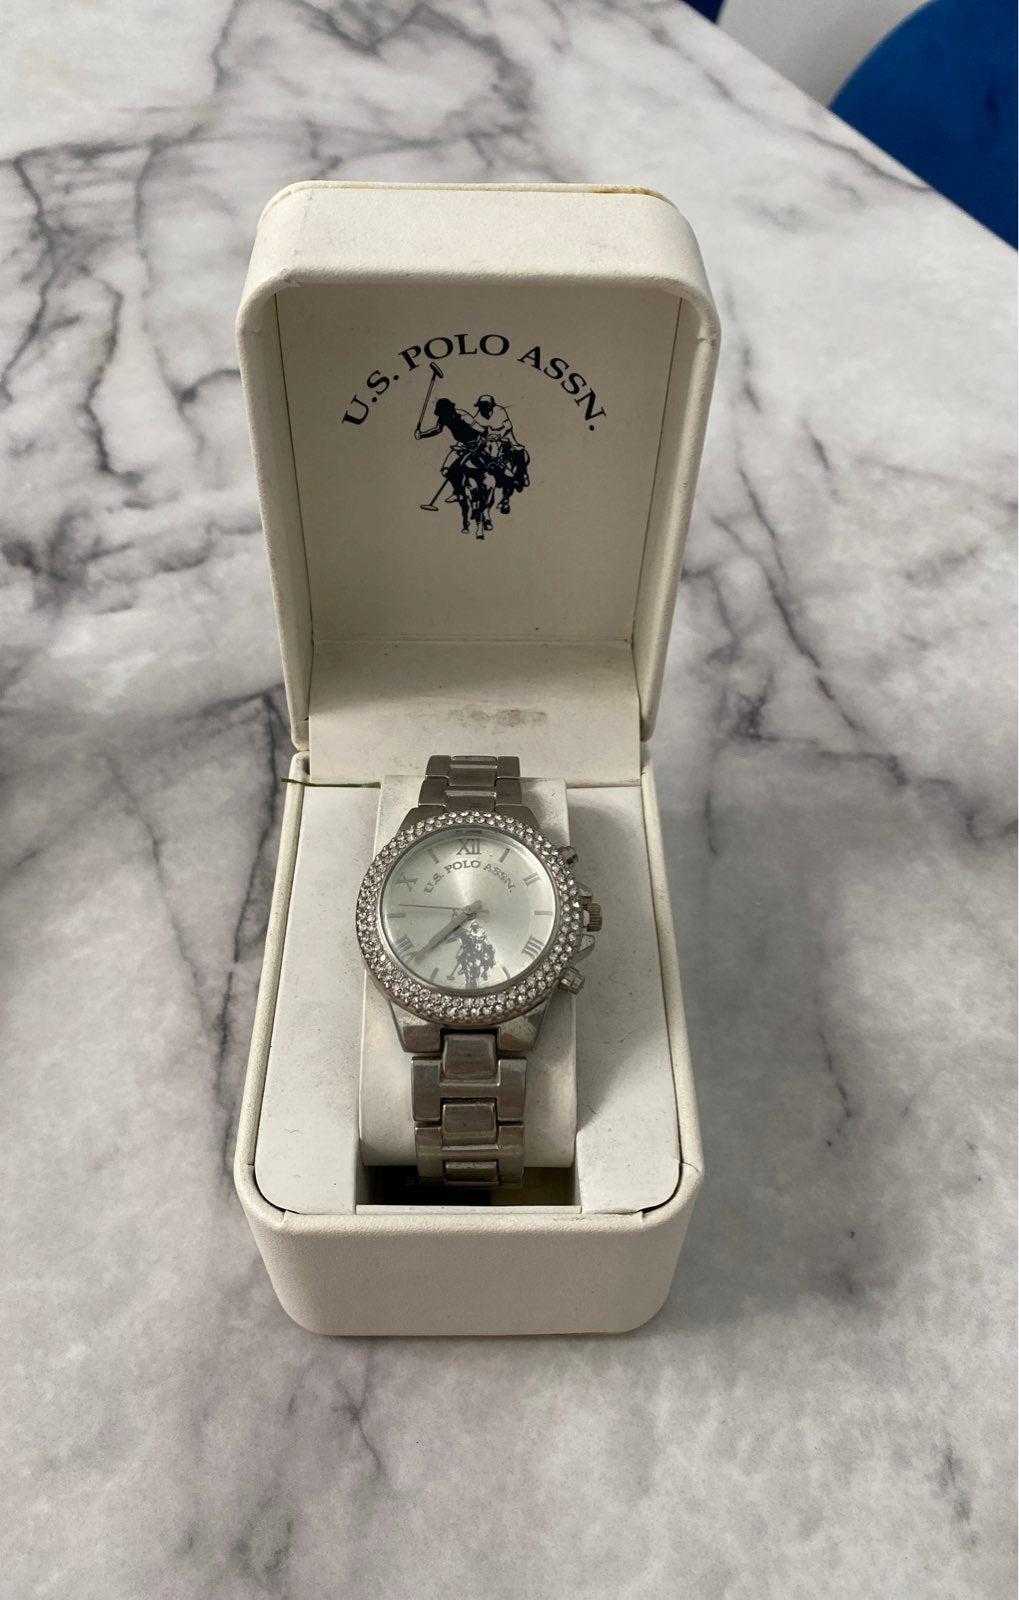 U.S. Polo Assn Women's watch